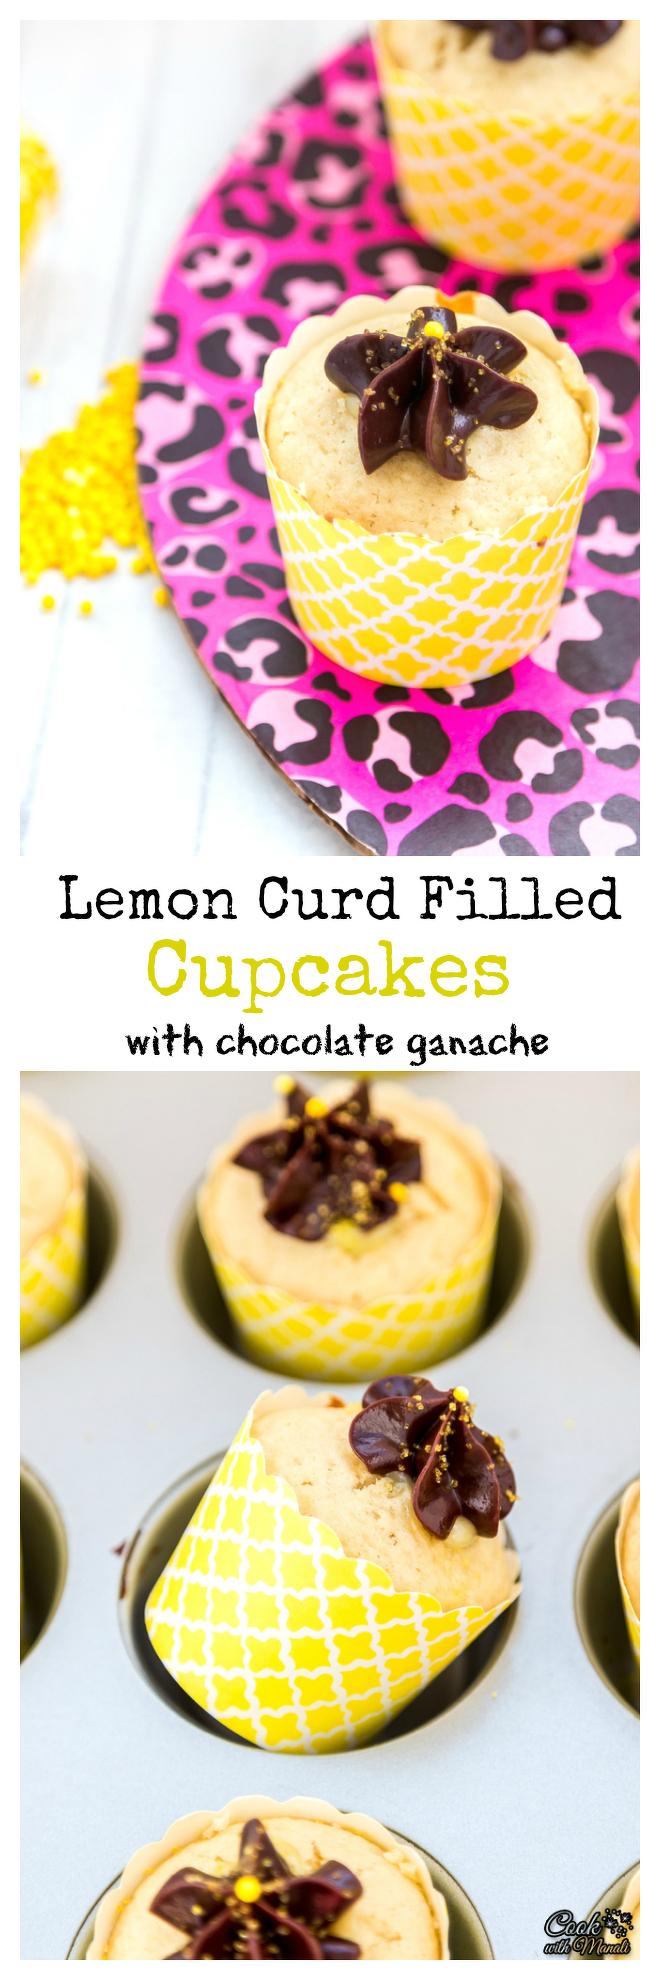 Lemon Curd Cupcakes Collage-nocwm